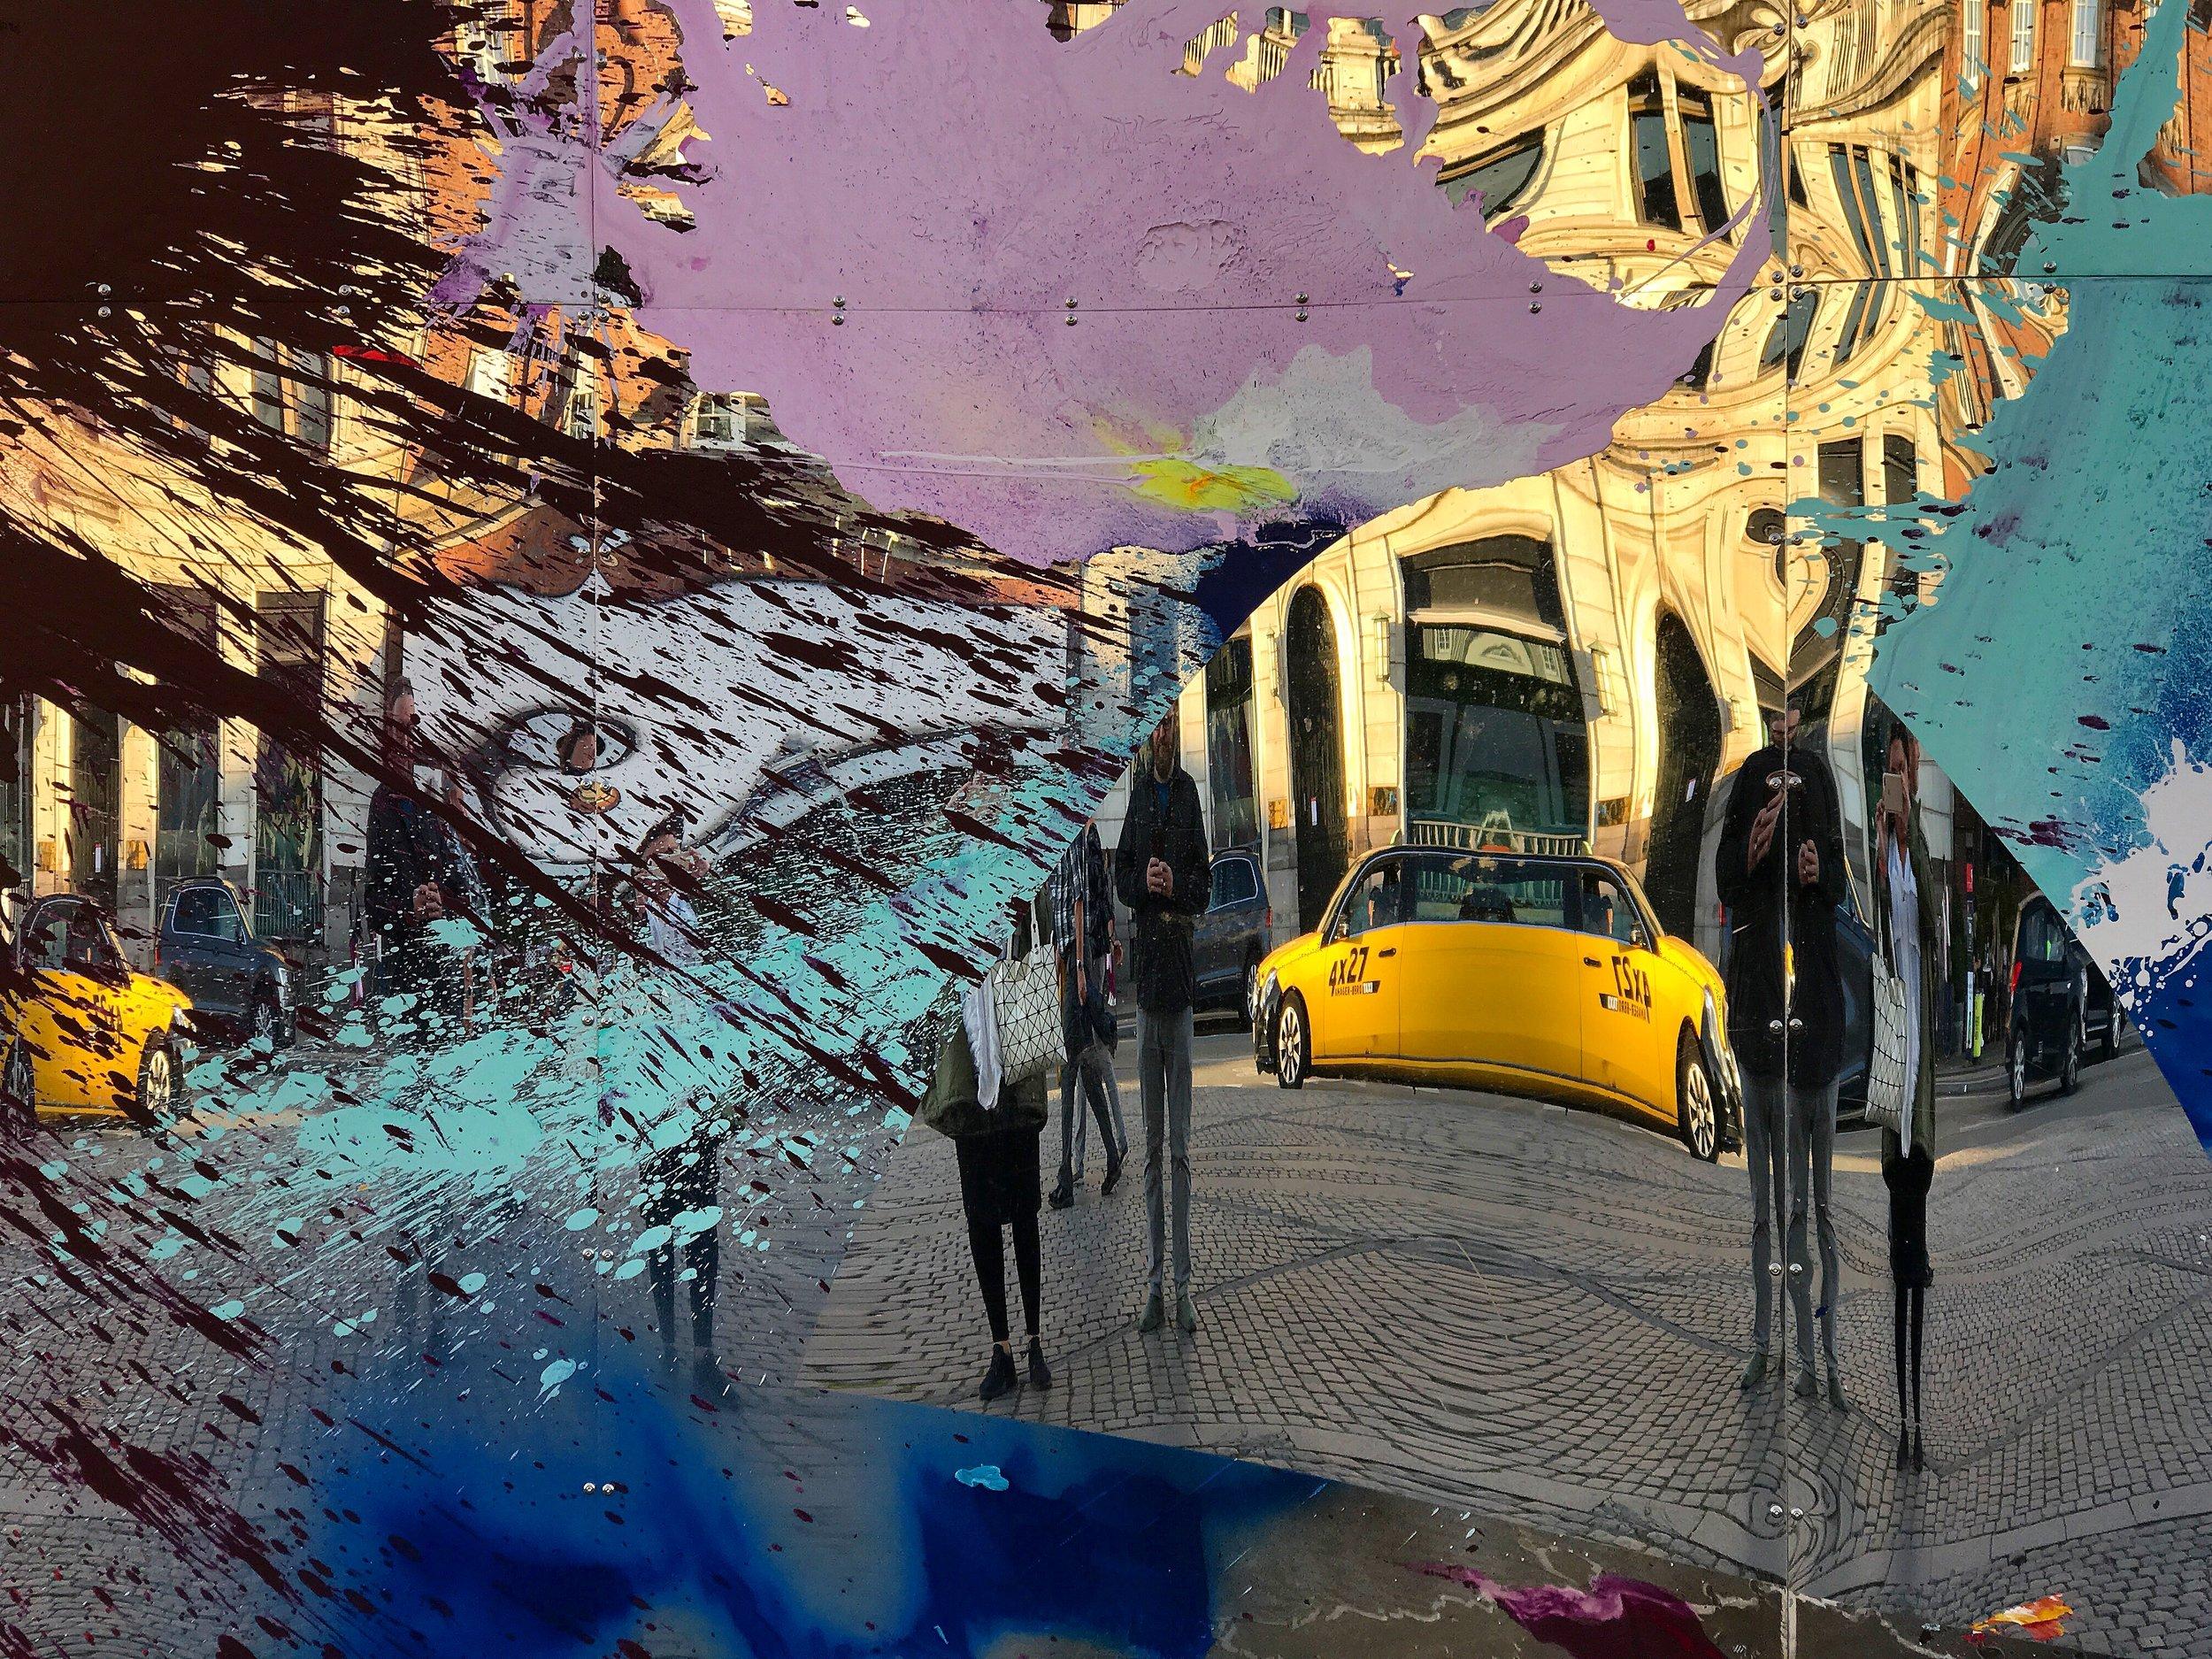 Self portrait, Copenhagen 2017